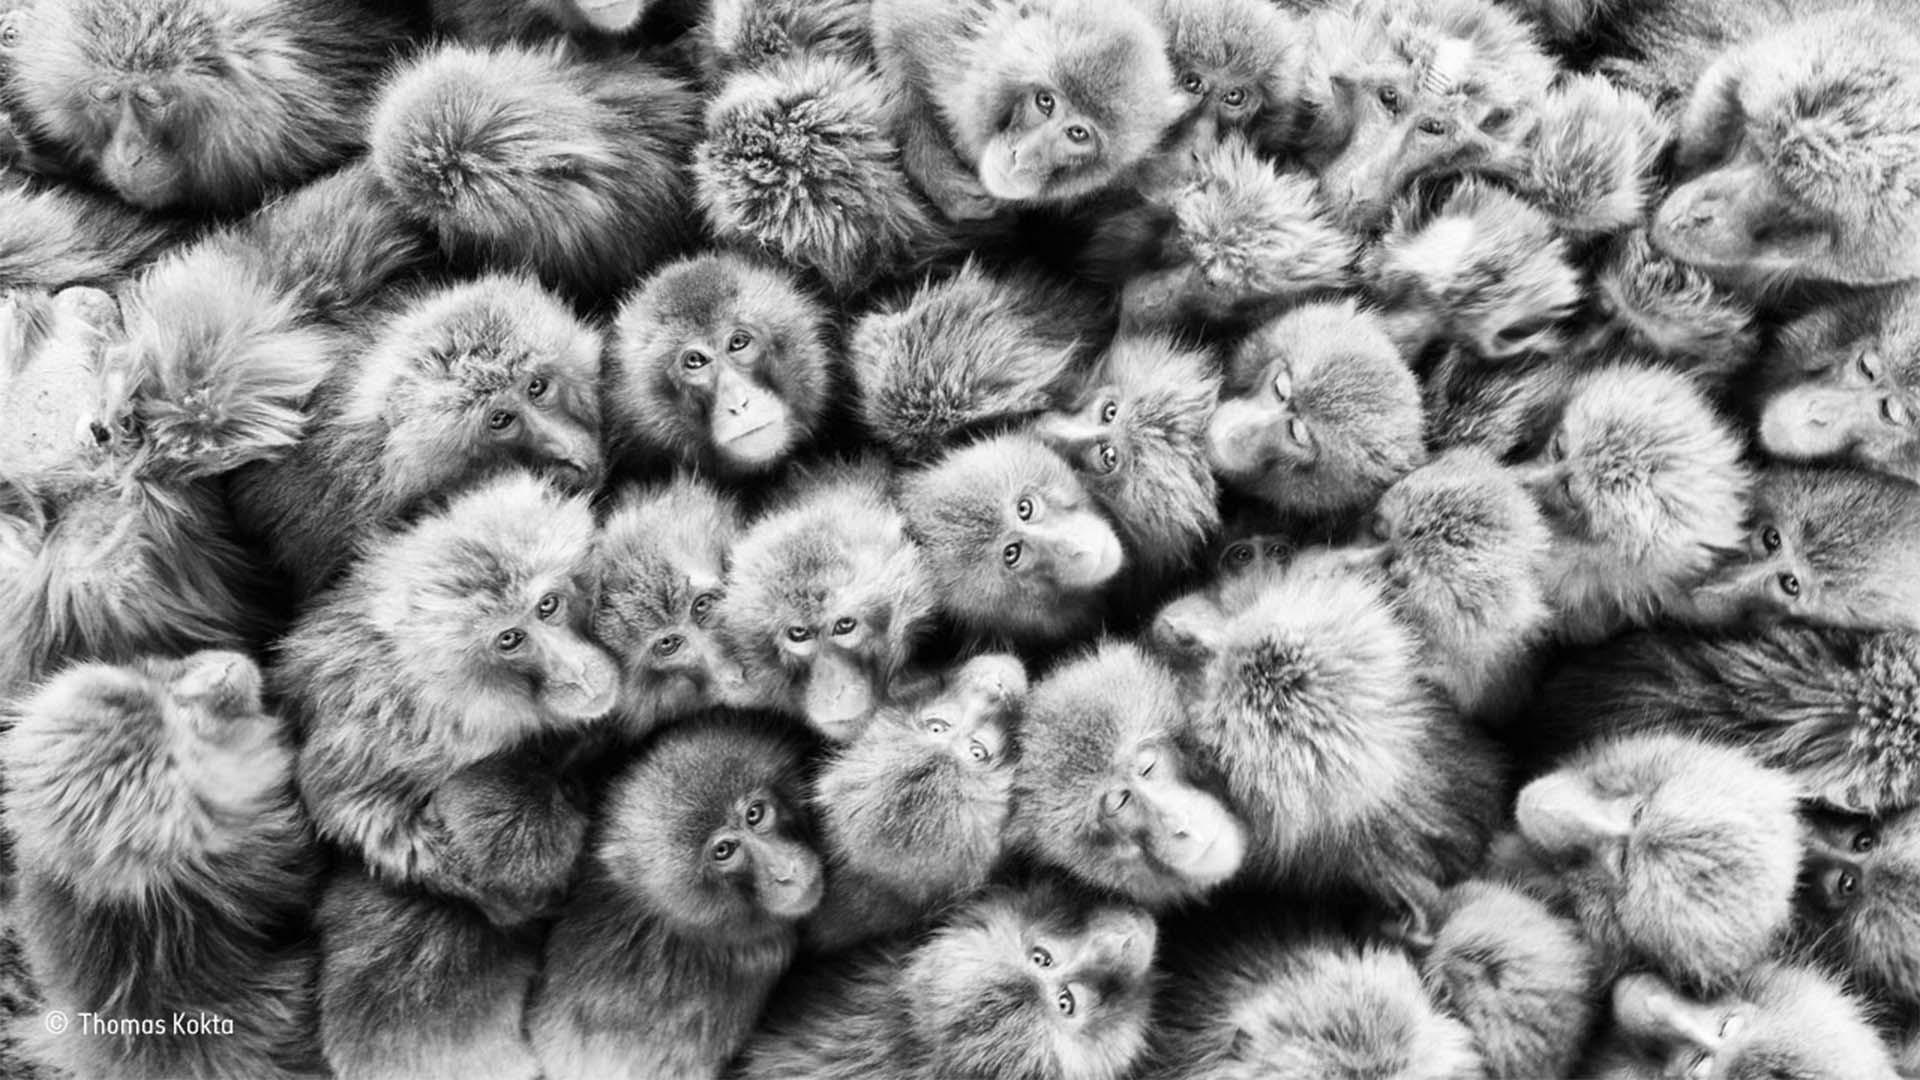 A group of Japanese monkeys huddle together to keep warm